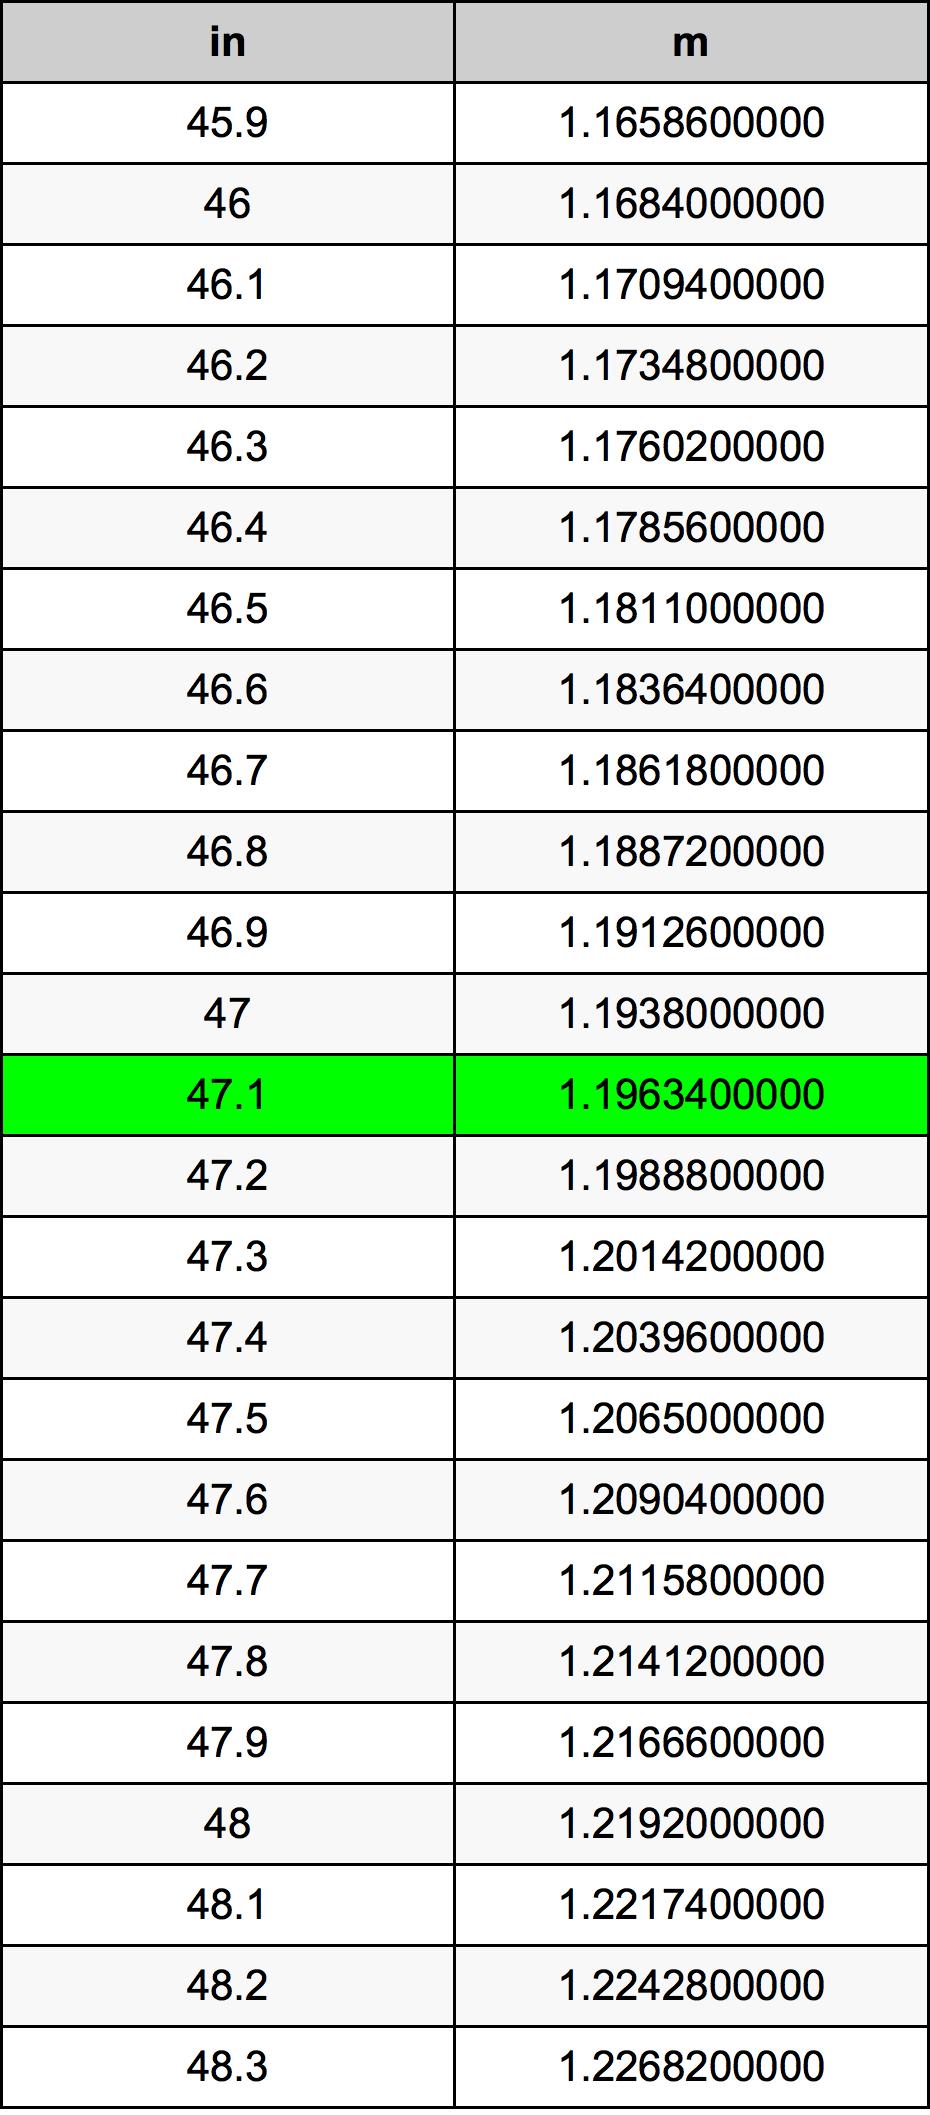 47.1 Inci konversi tabel